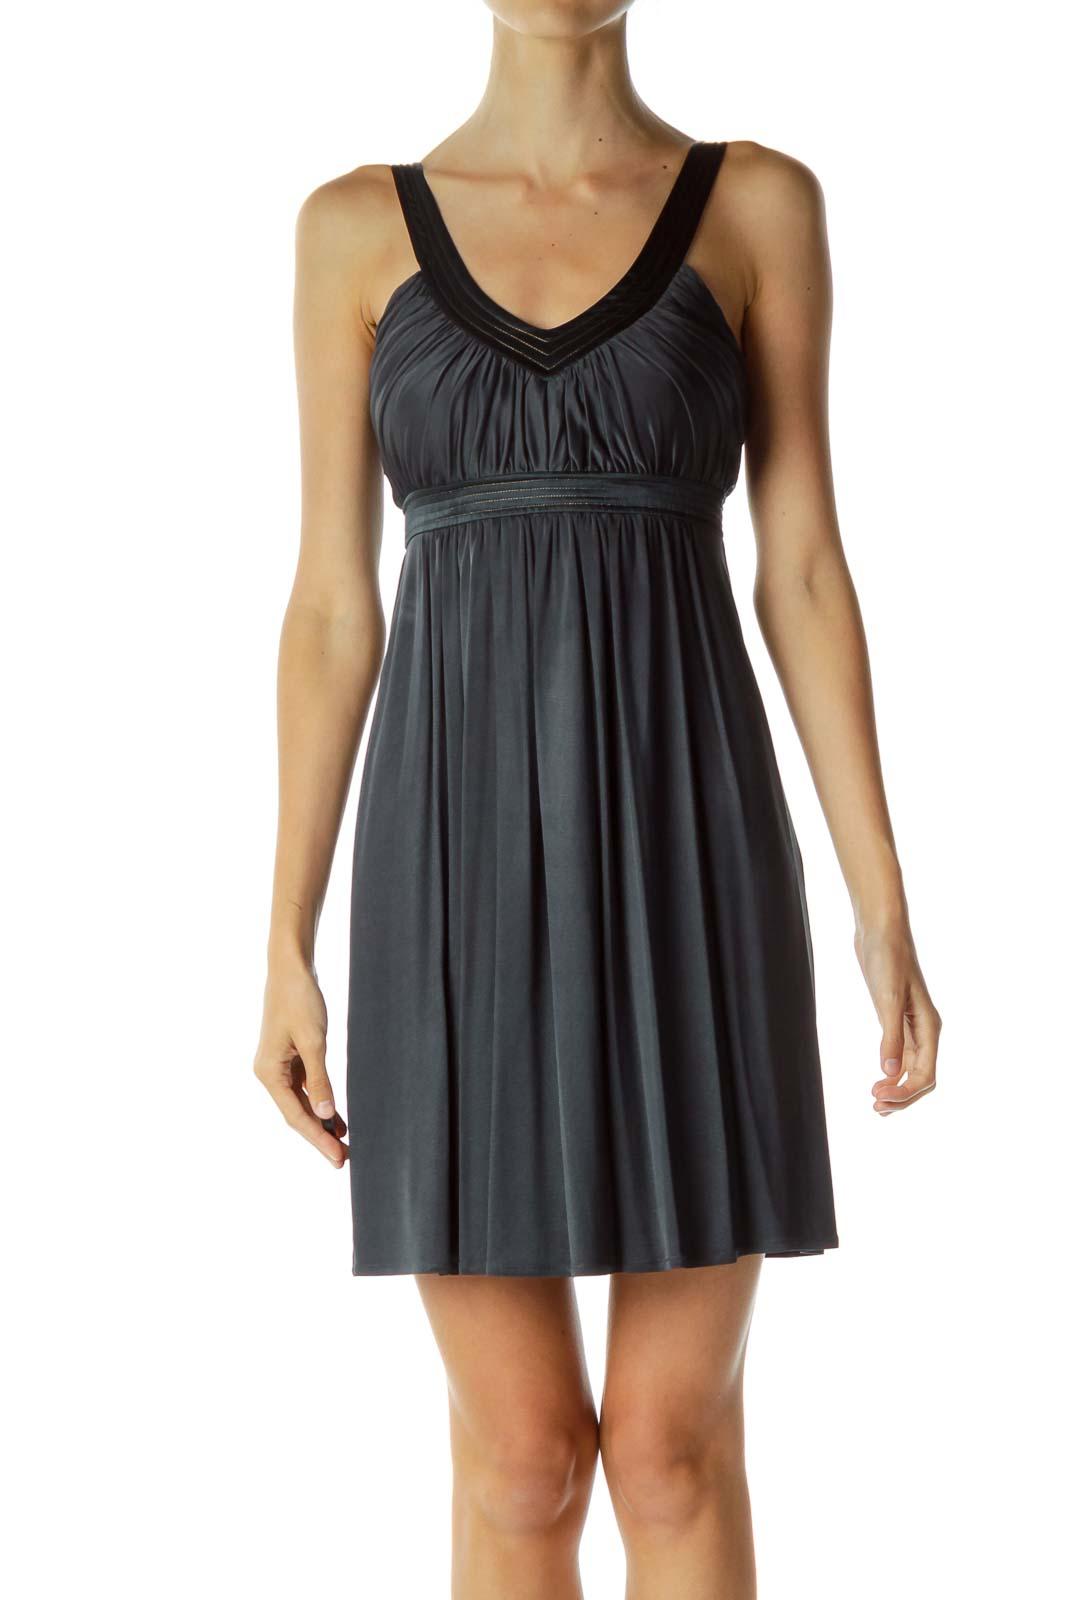 Dark Blue V-Neck Dress with Gold Lining